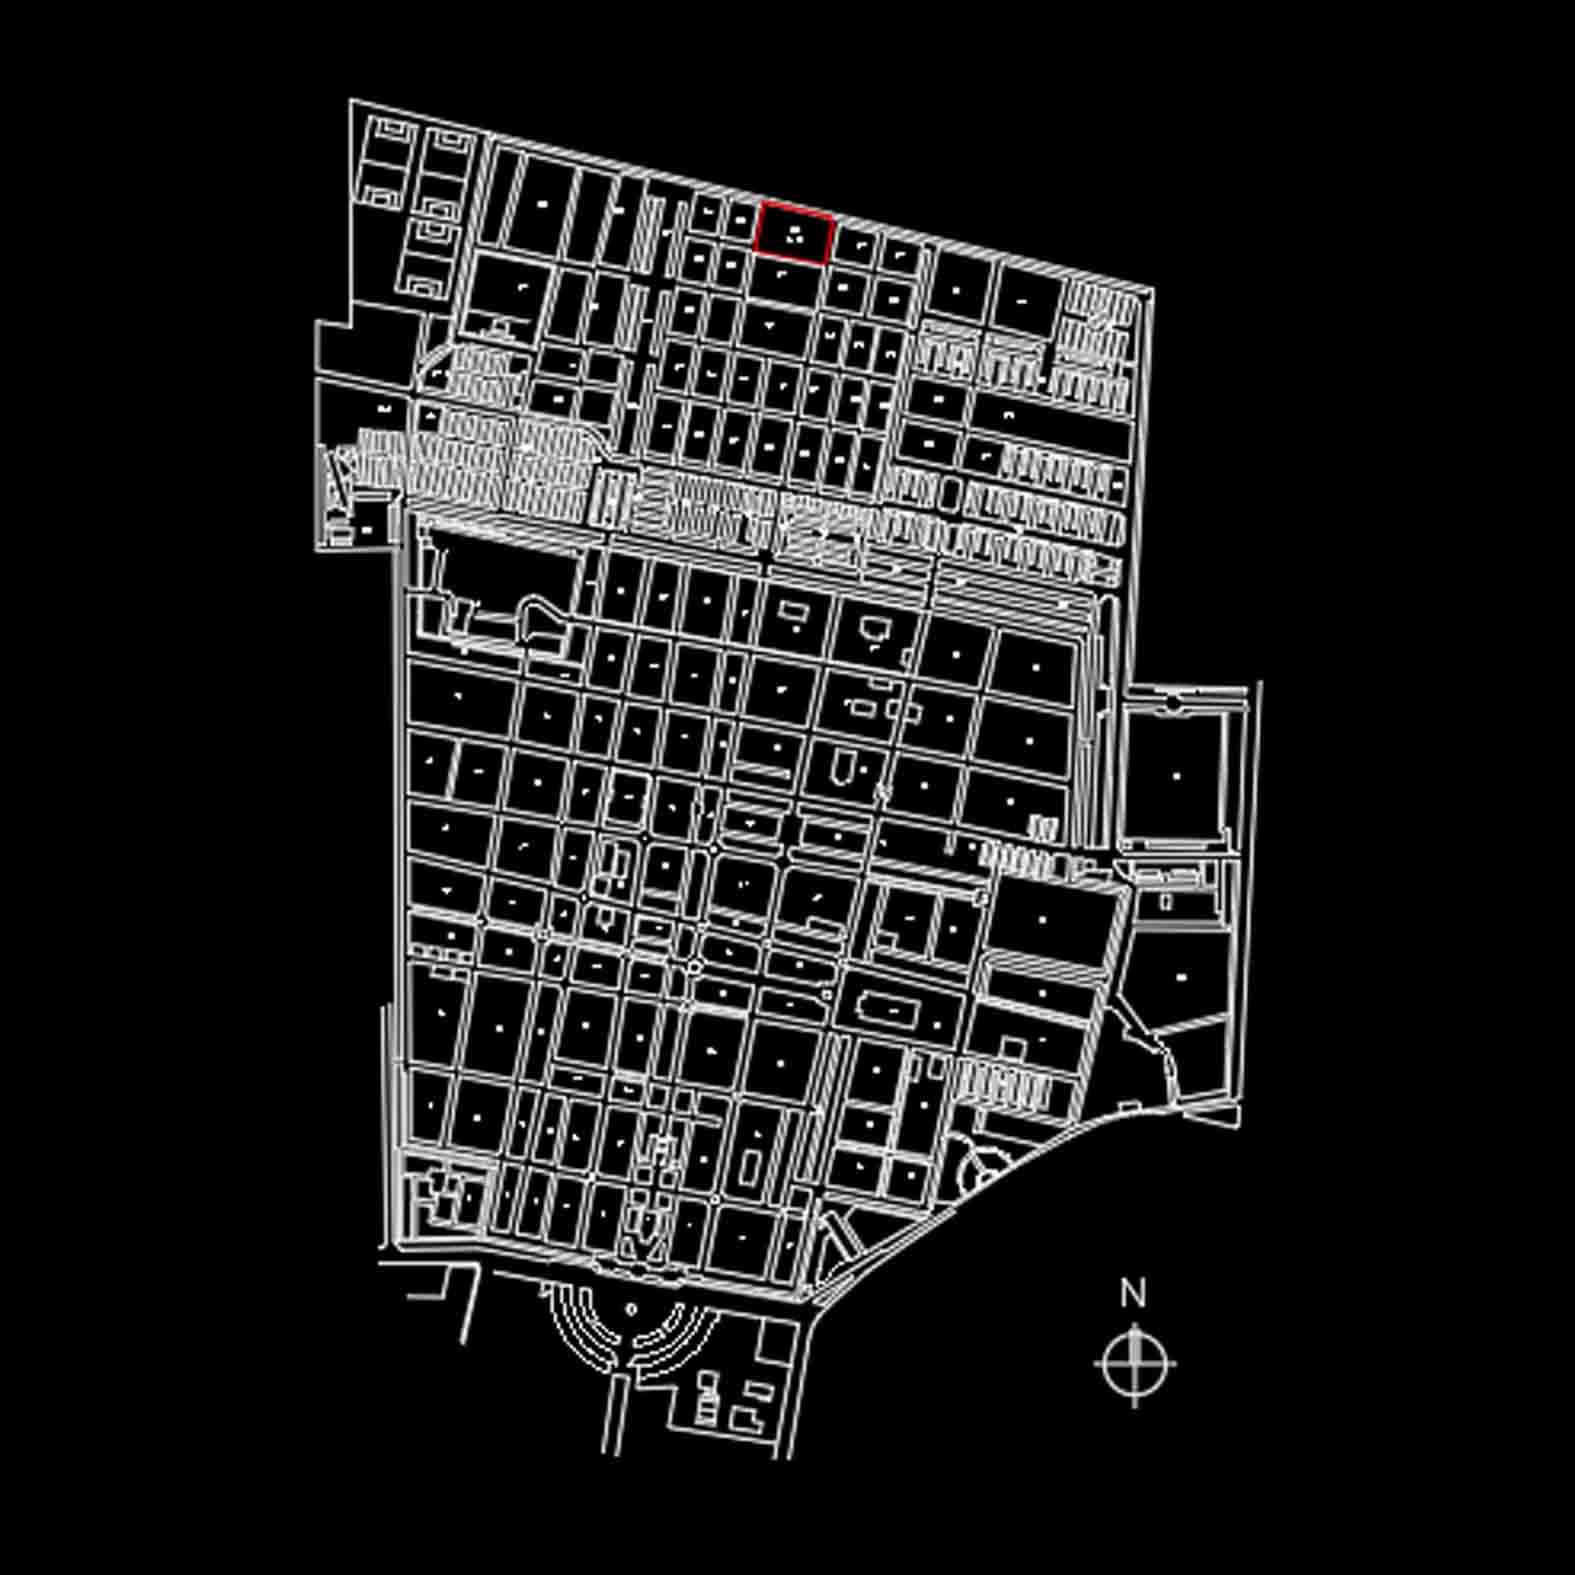 Plano: Cementerio General Patio 29 / Recoleta